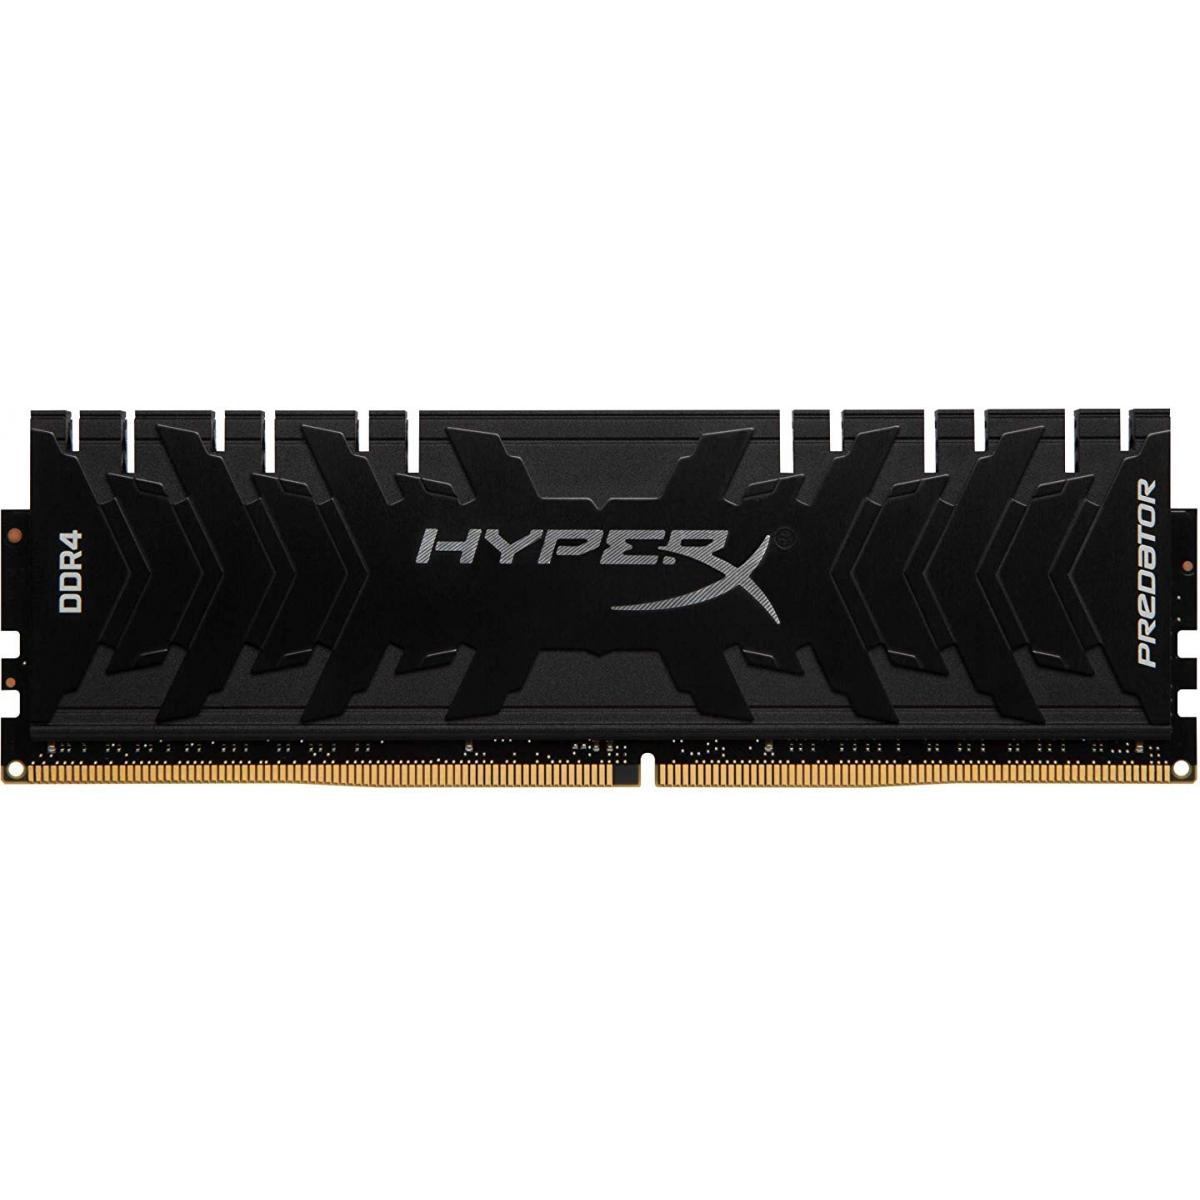 Memória DDR4 Kingston HyperX Predator, 16GB 3200MHZ, Black, HX432C16PB3/16